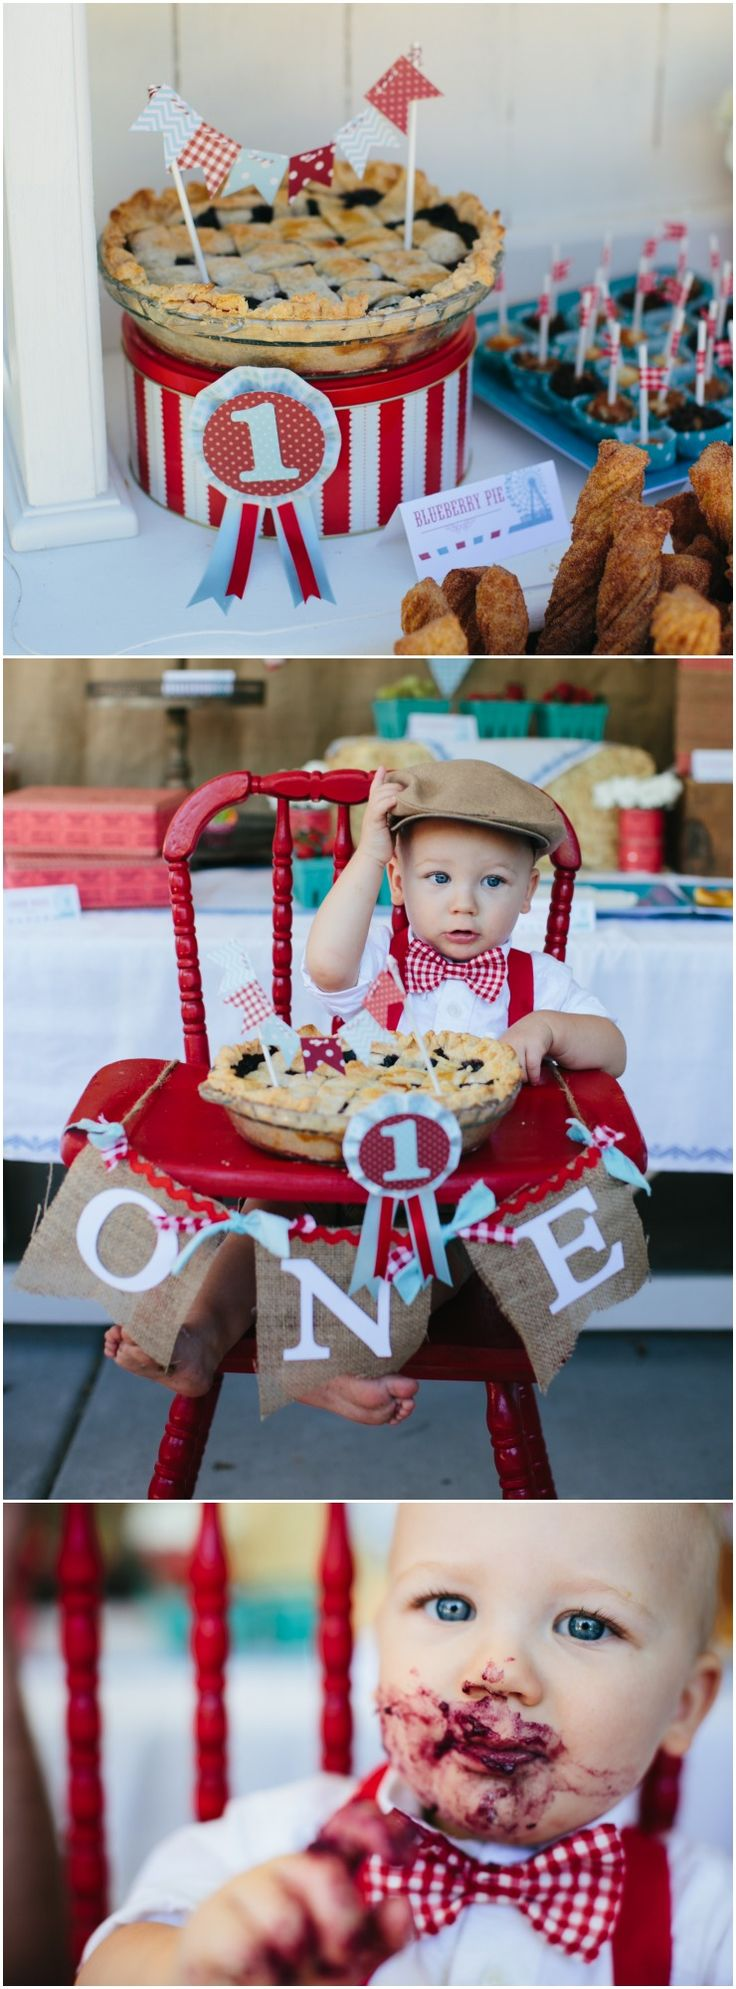 Pie instead of smash cake - cute! www.weheartparties.com